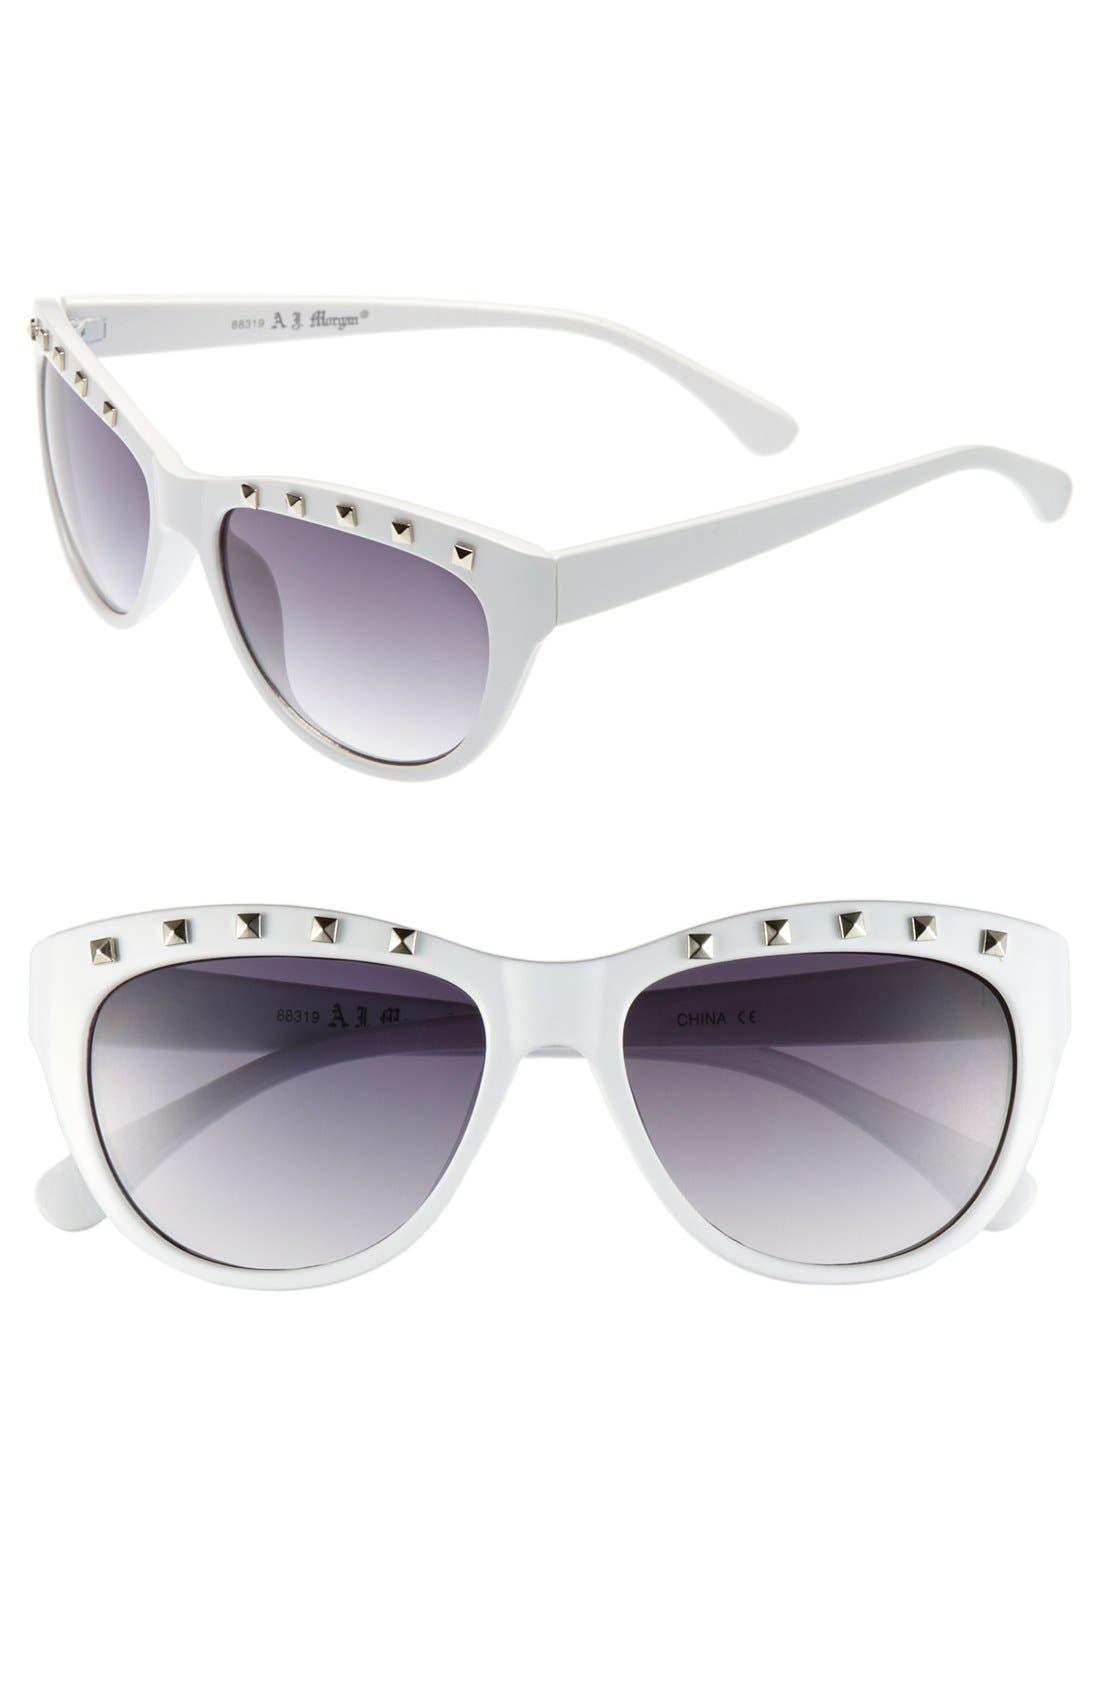 Main Image - A.J. Morgan 'Casino' Sunglasses